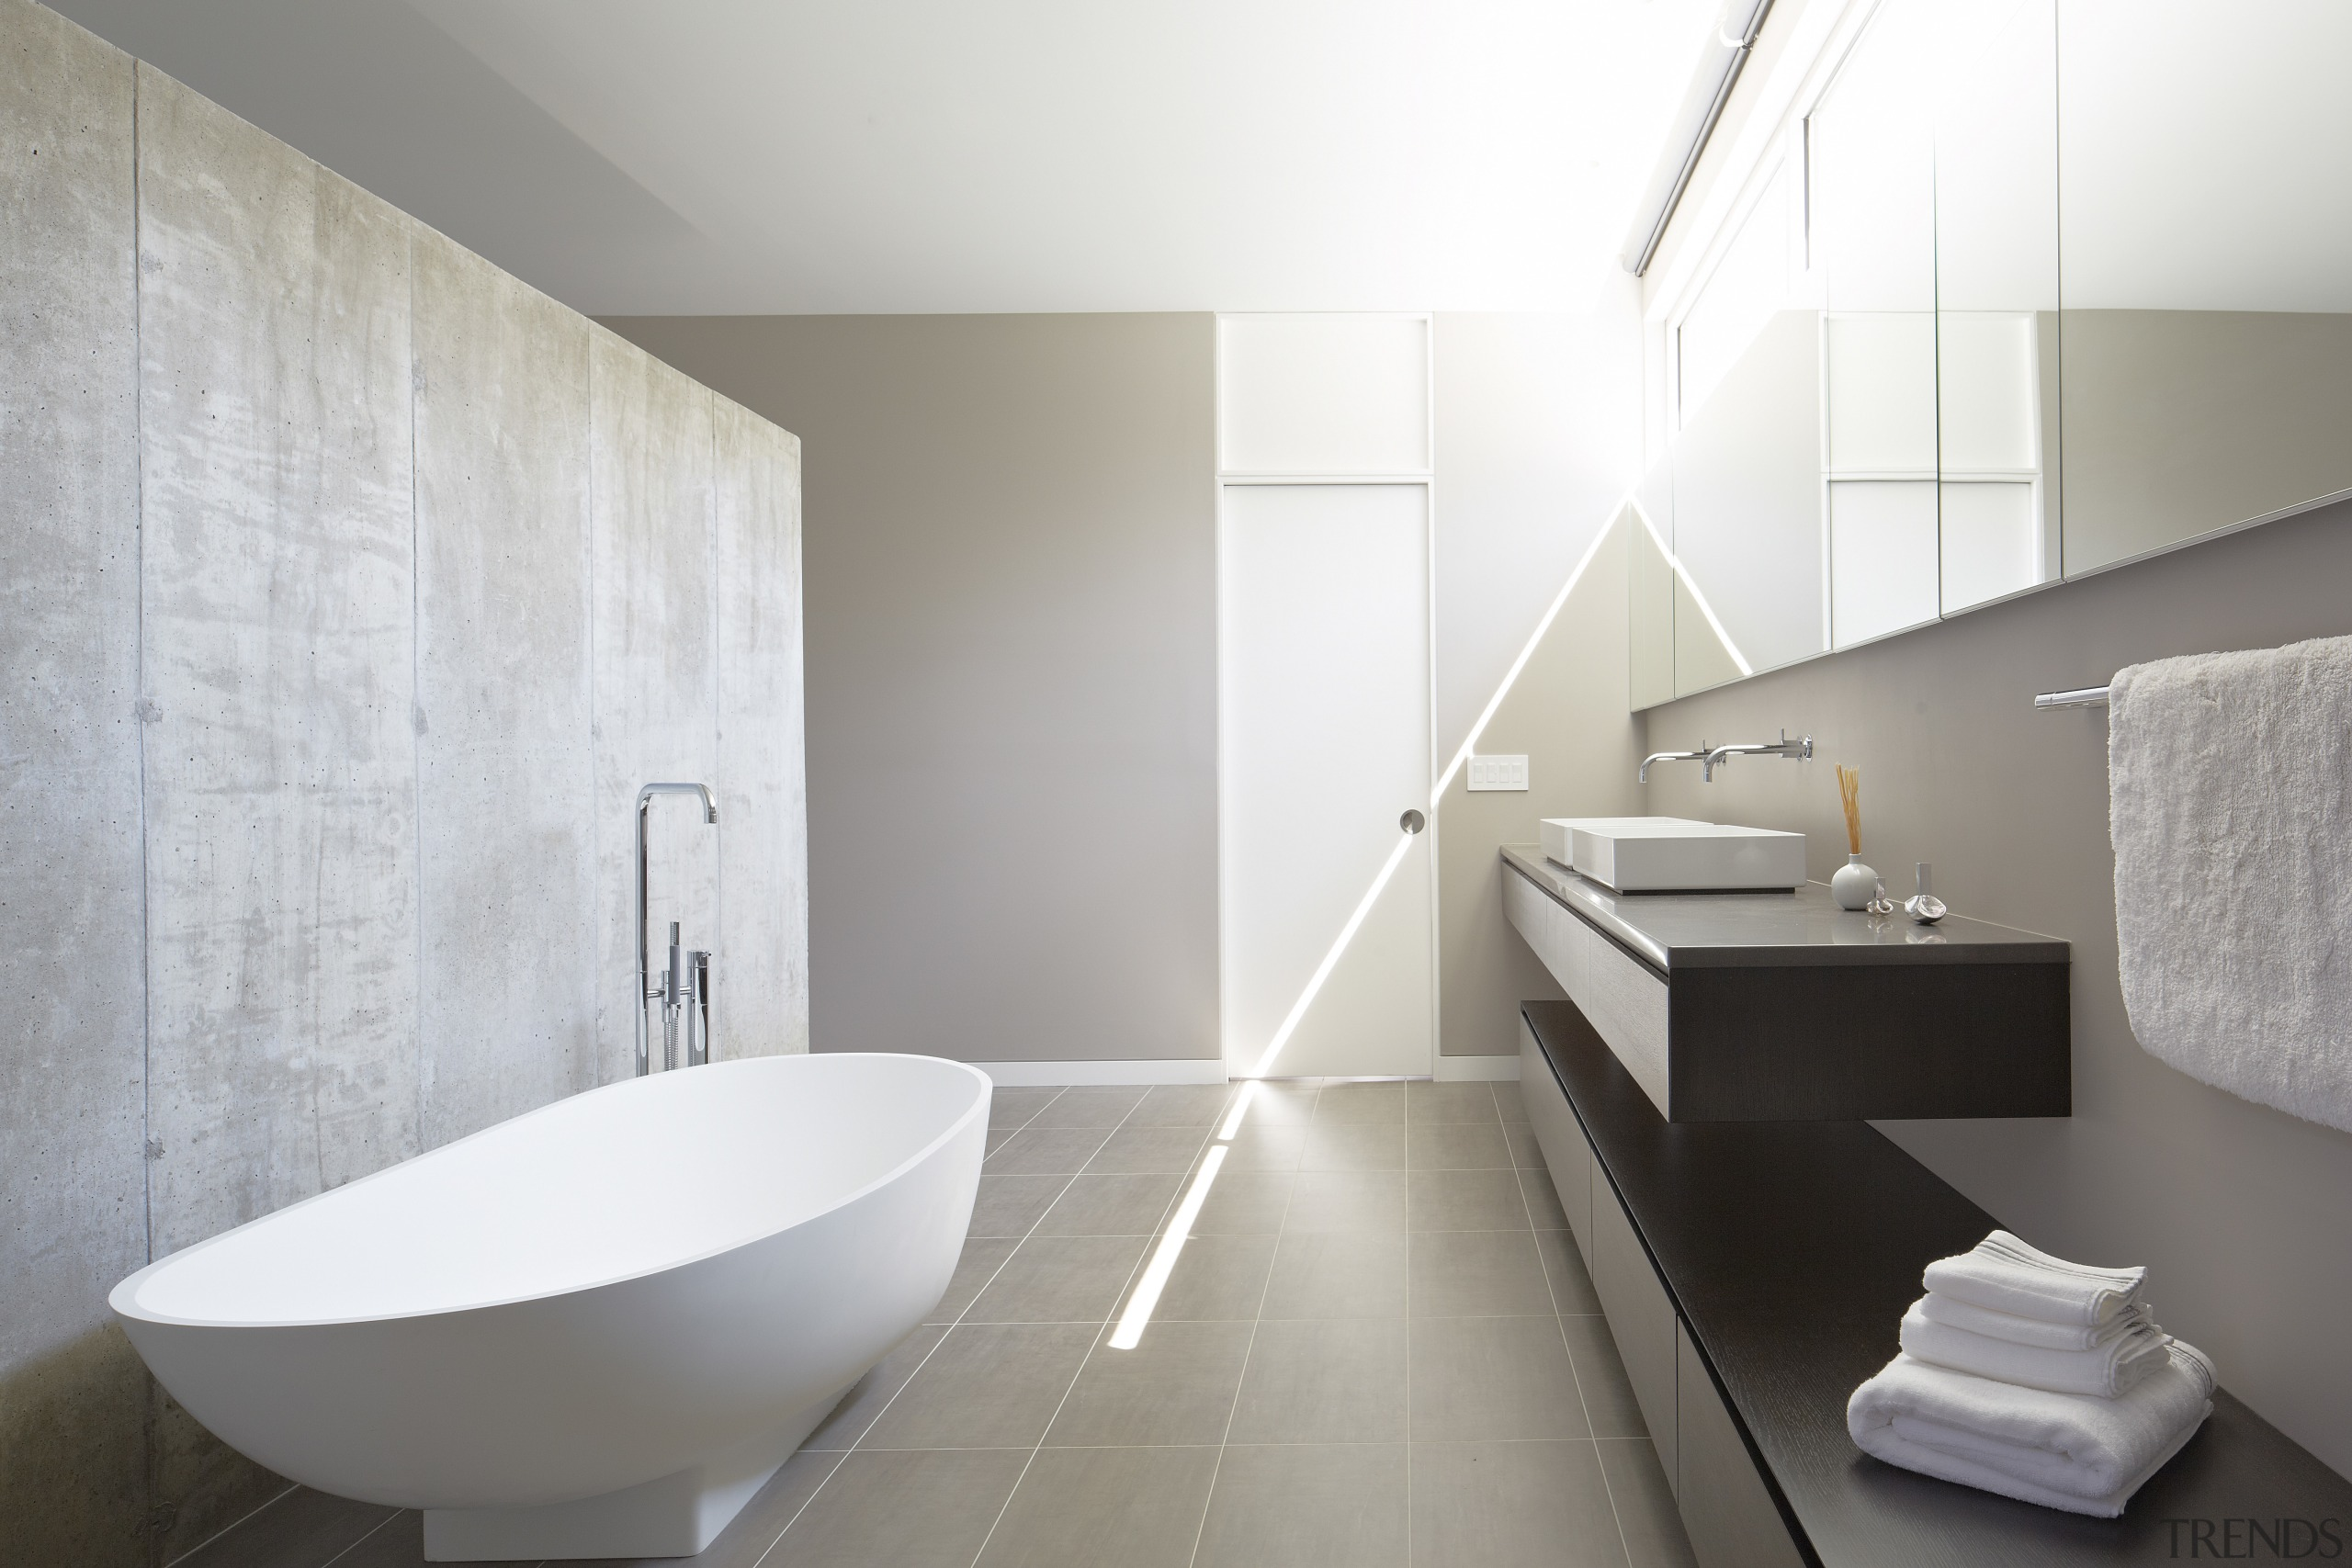 In this master bathroom by Studio Dwell, clerestory architecture, bathroom, bathroom sink, bidet, ceramic, floor, interior design, plumbing fixture, product design, room, sink, tap, tile, wall, white, gray